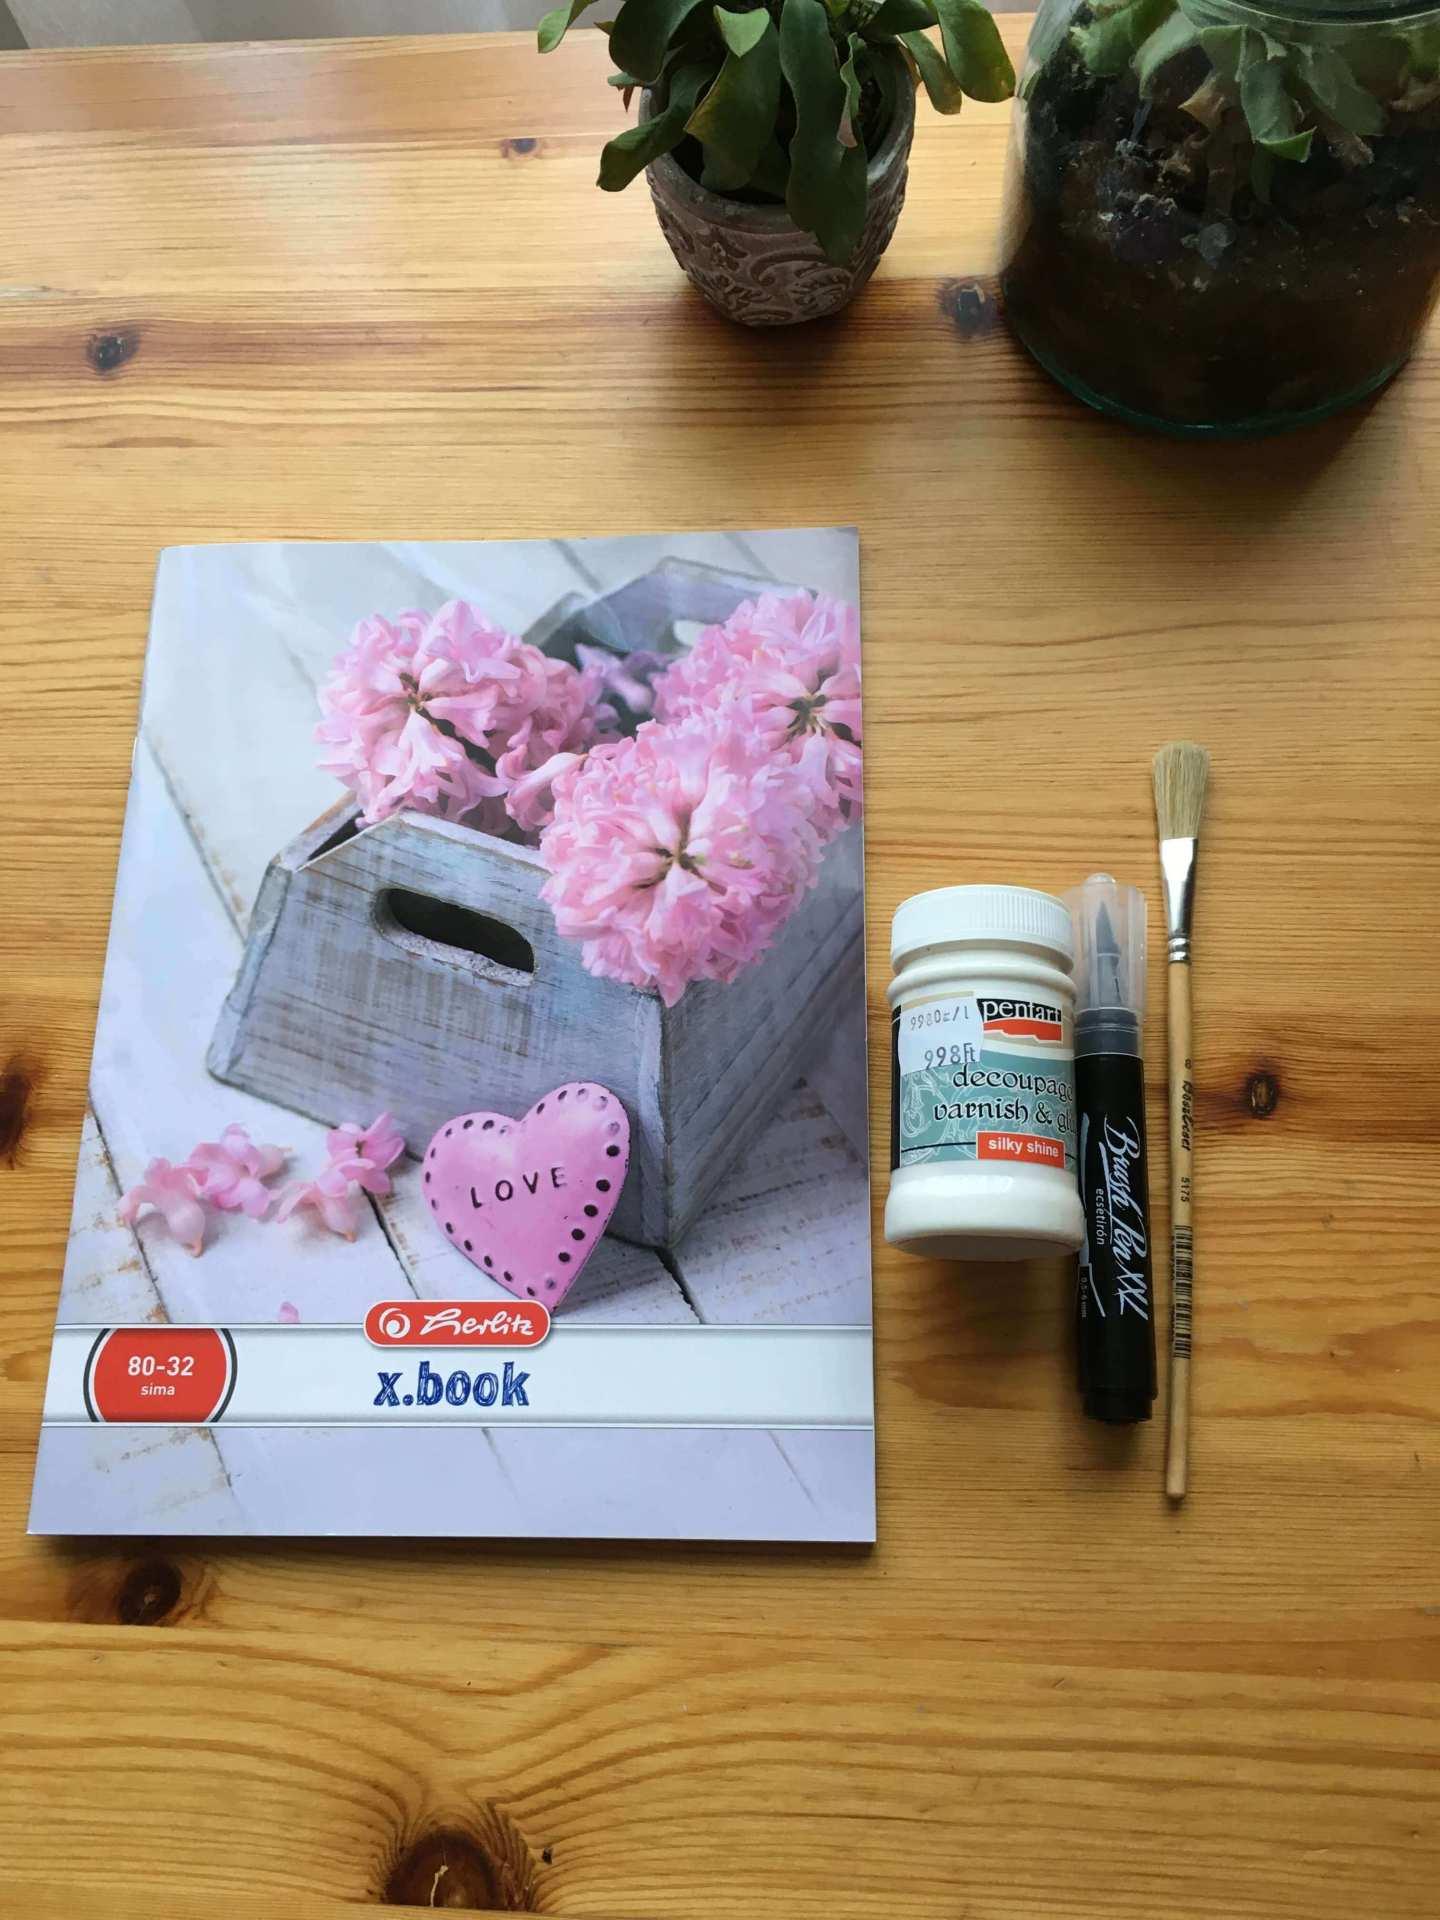 hello-life-blog-virág-emlékönyv-ötletlek-csináld-magad